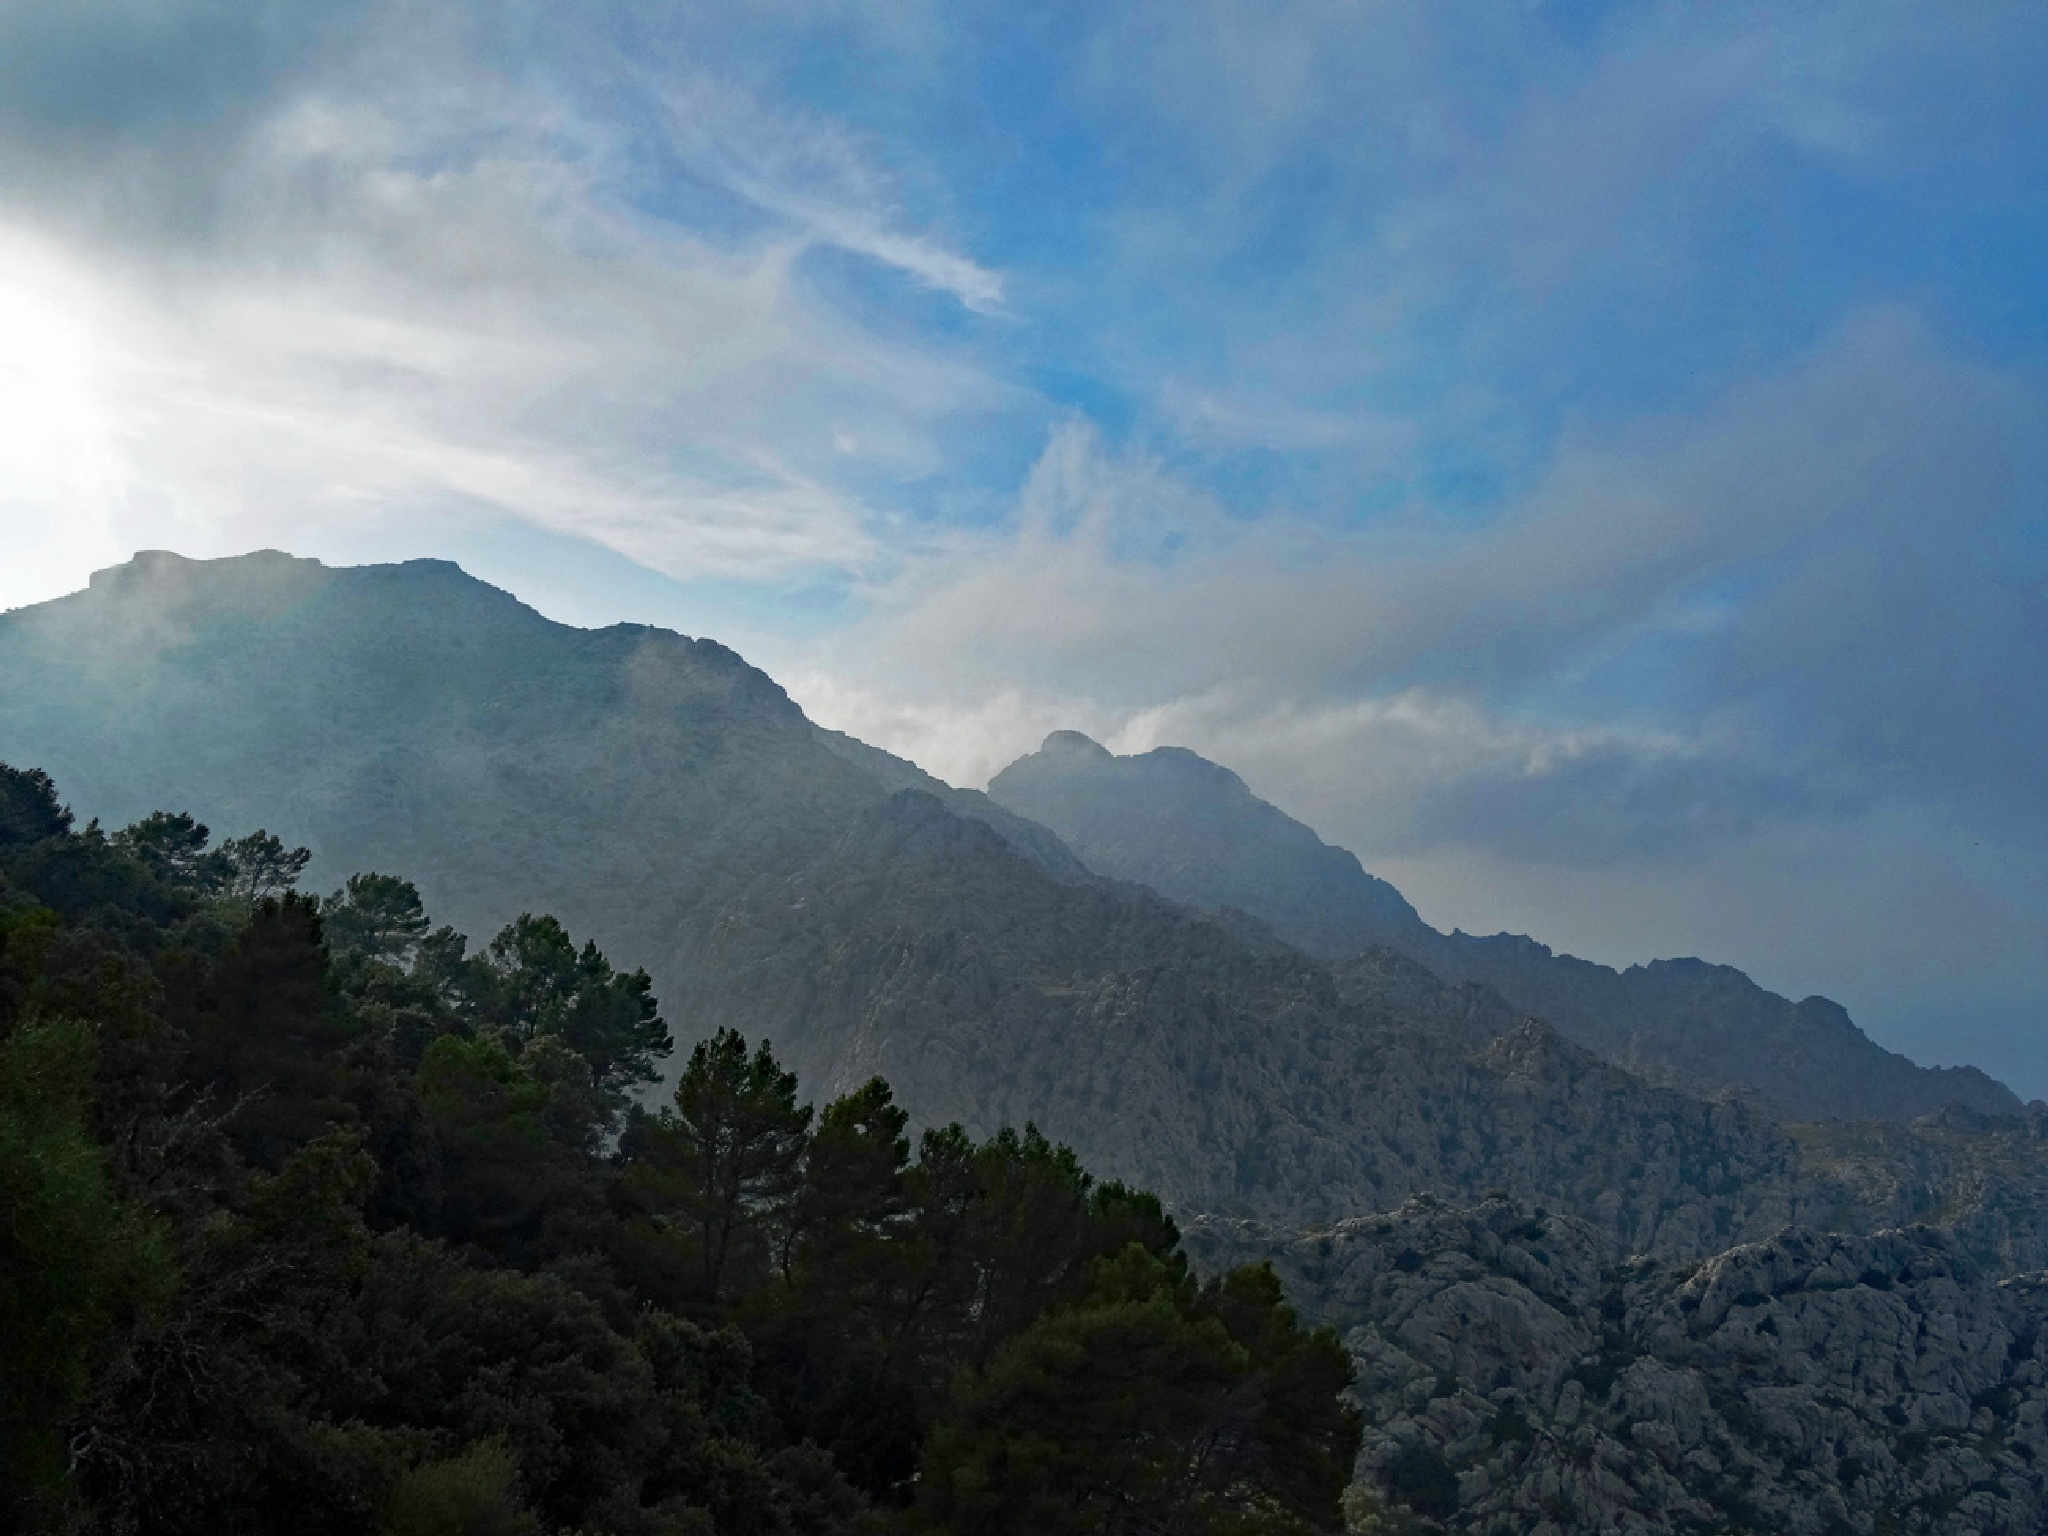 Serra de Tramuntana by constantin marwitz